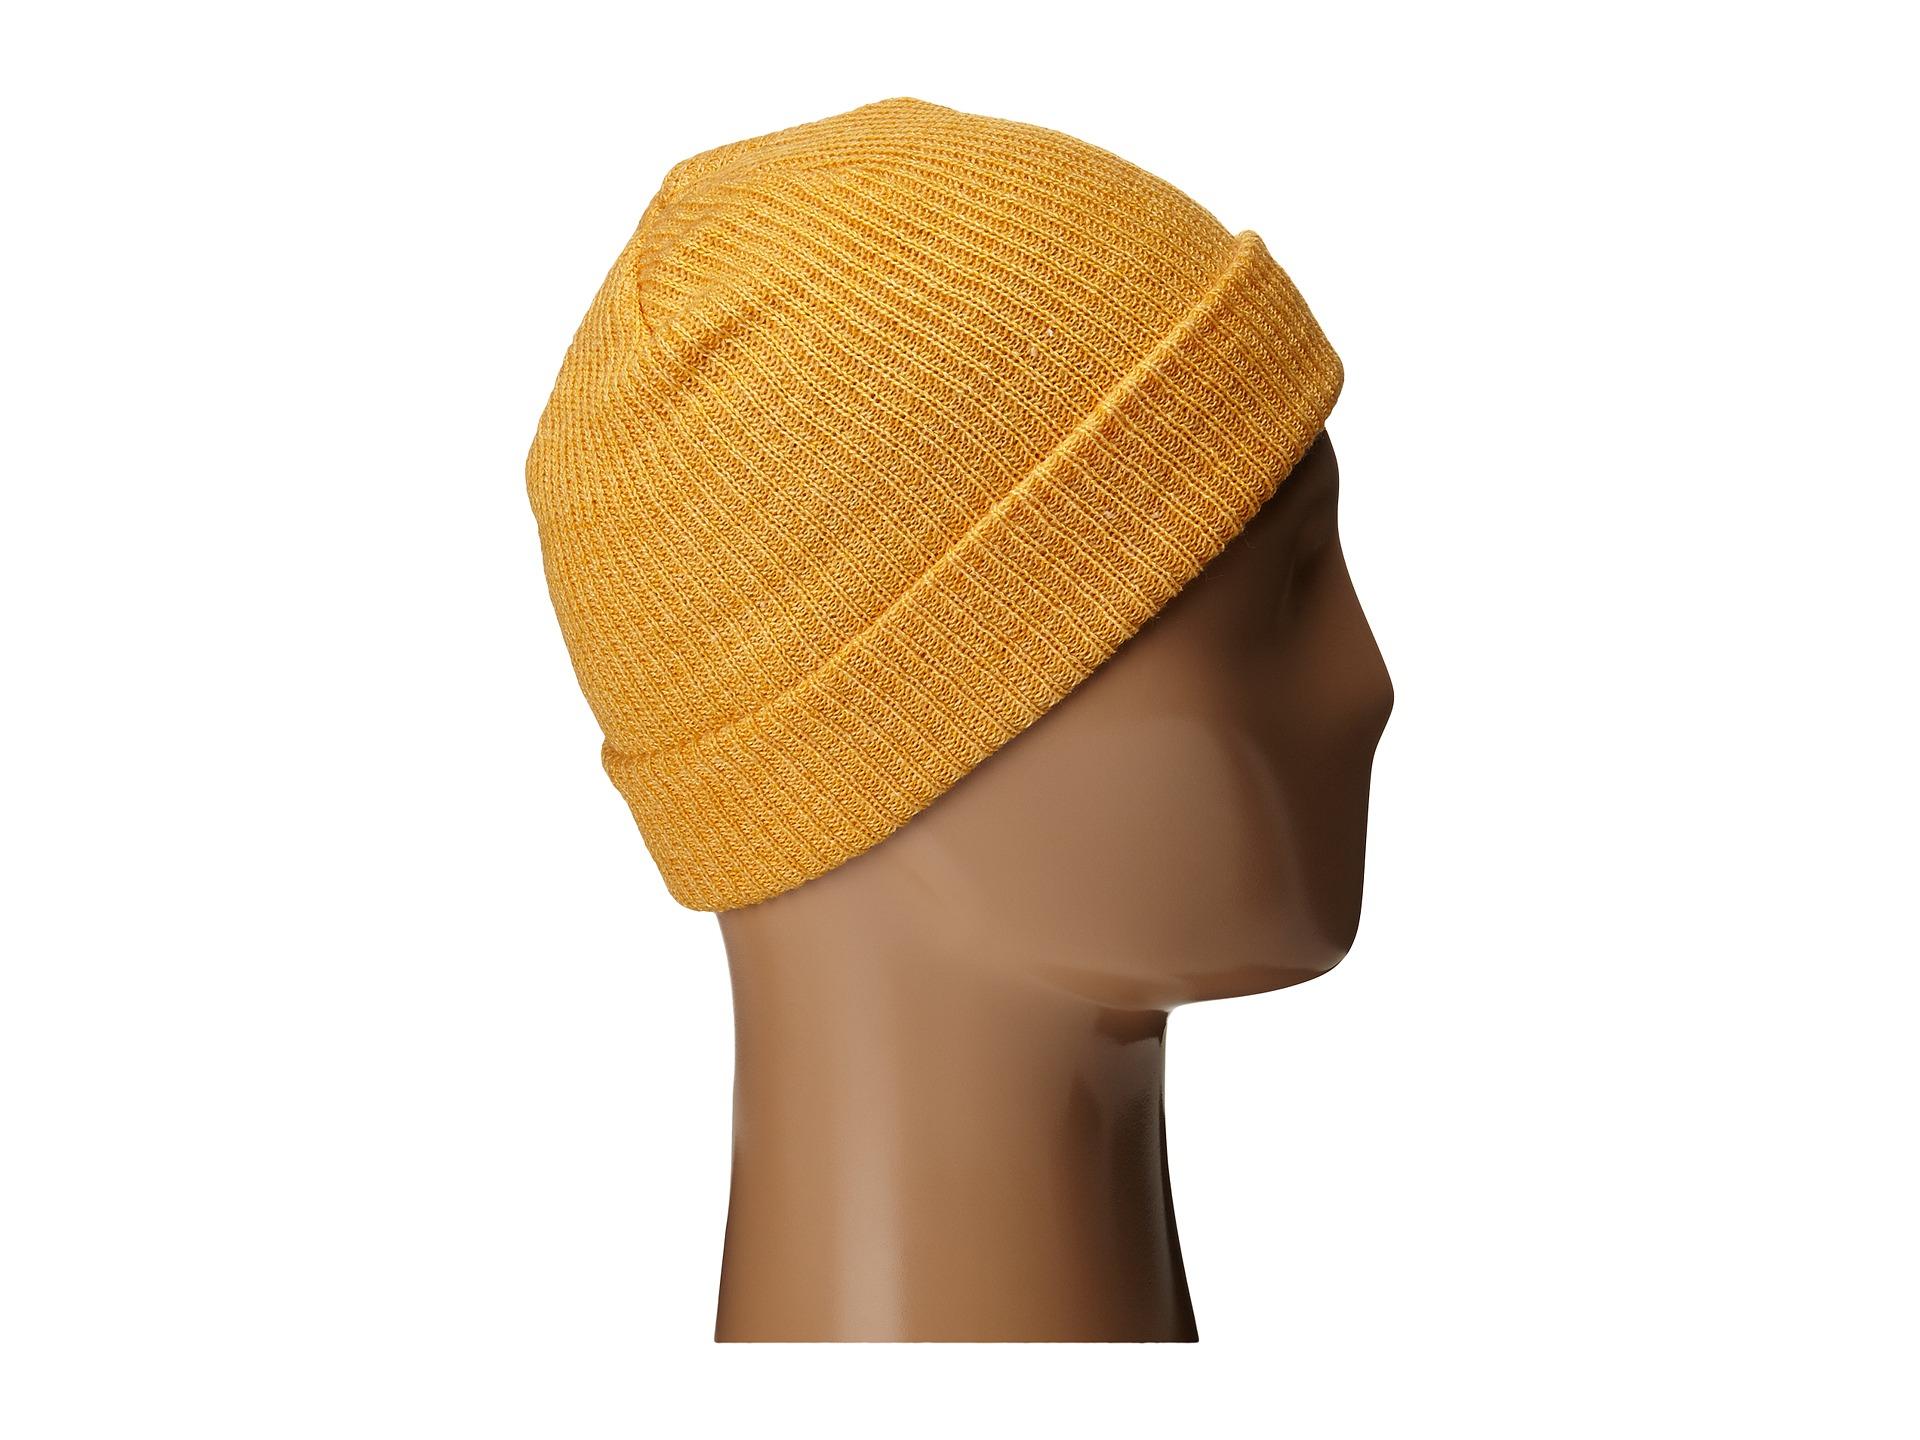 aa57762751dc Lyst - Nike Fisherman Beanie in Yellow for Men